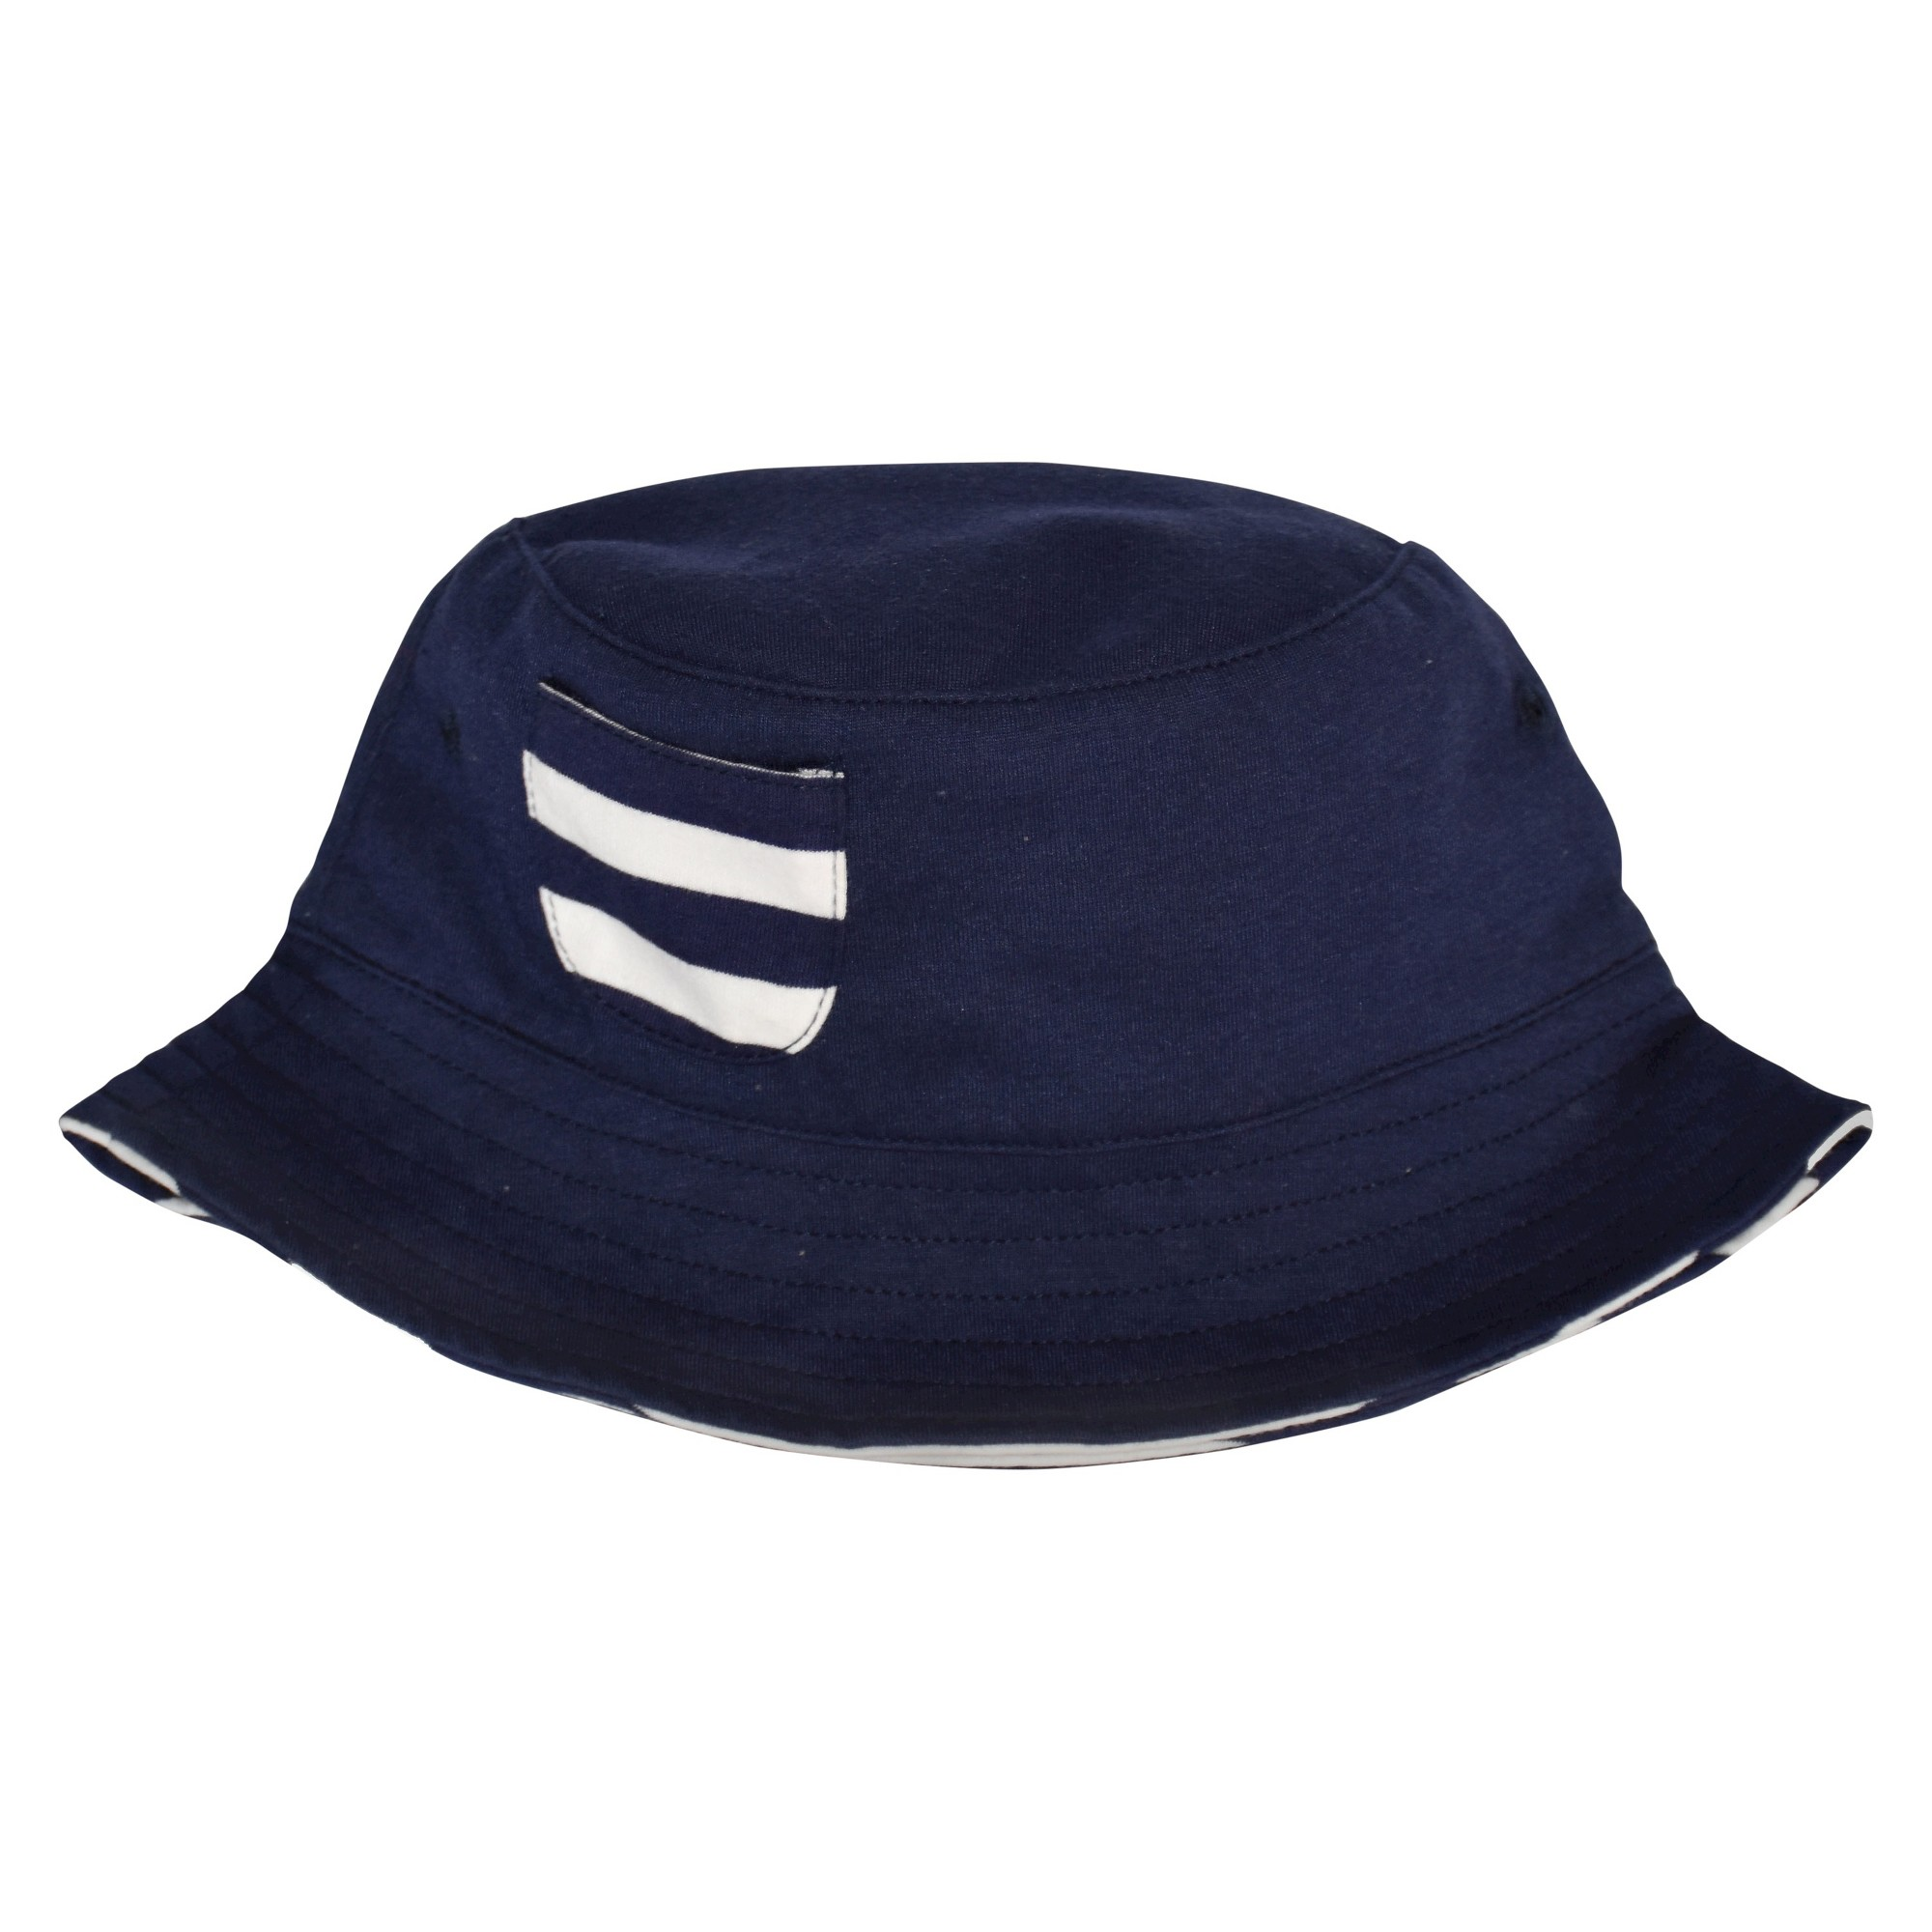 d0a1827216f Toddler Boys  Bucket Hat - Cat   Jack Navy (Blue) 2T-5T